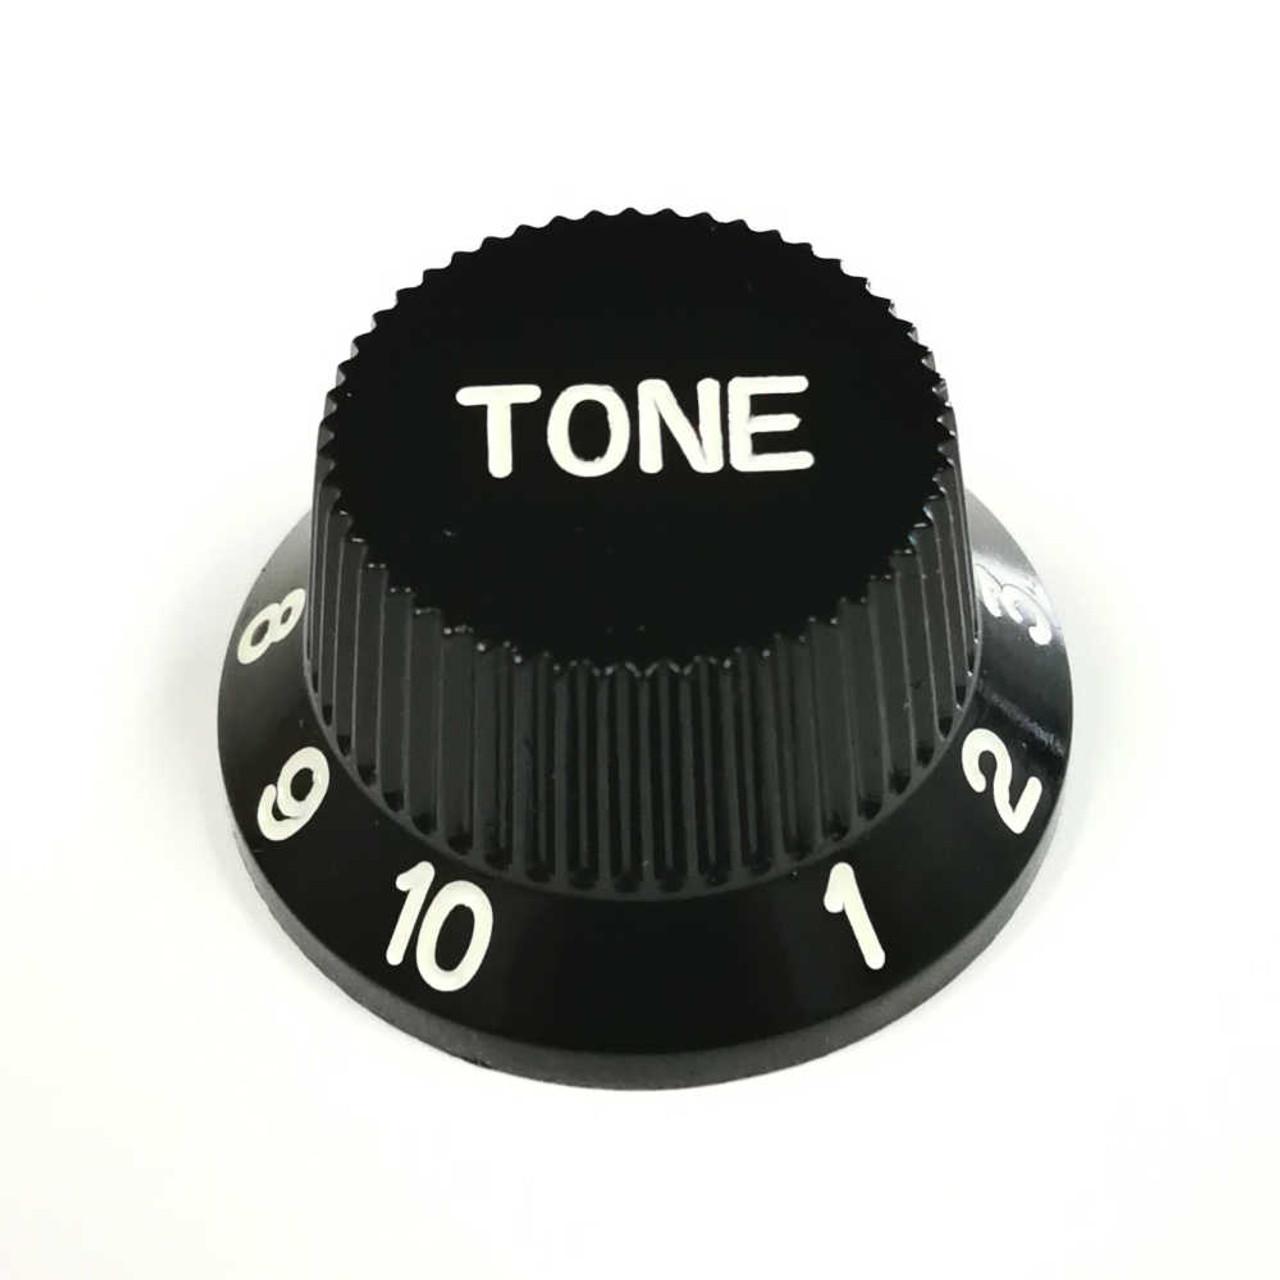 Strat Knob Tone - 24-spline Black